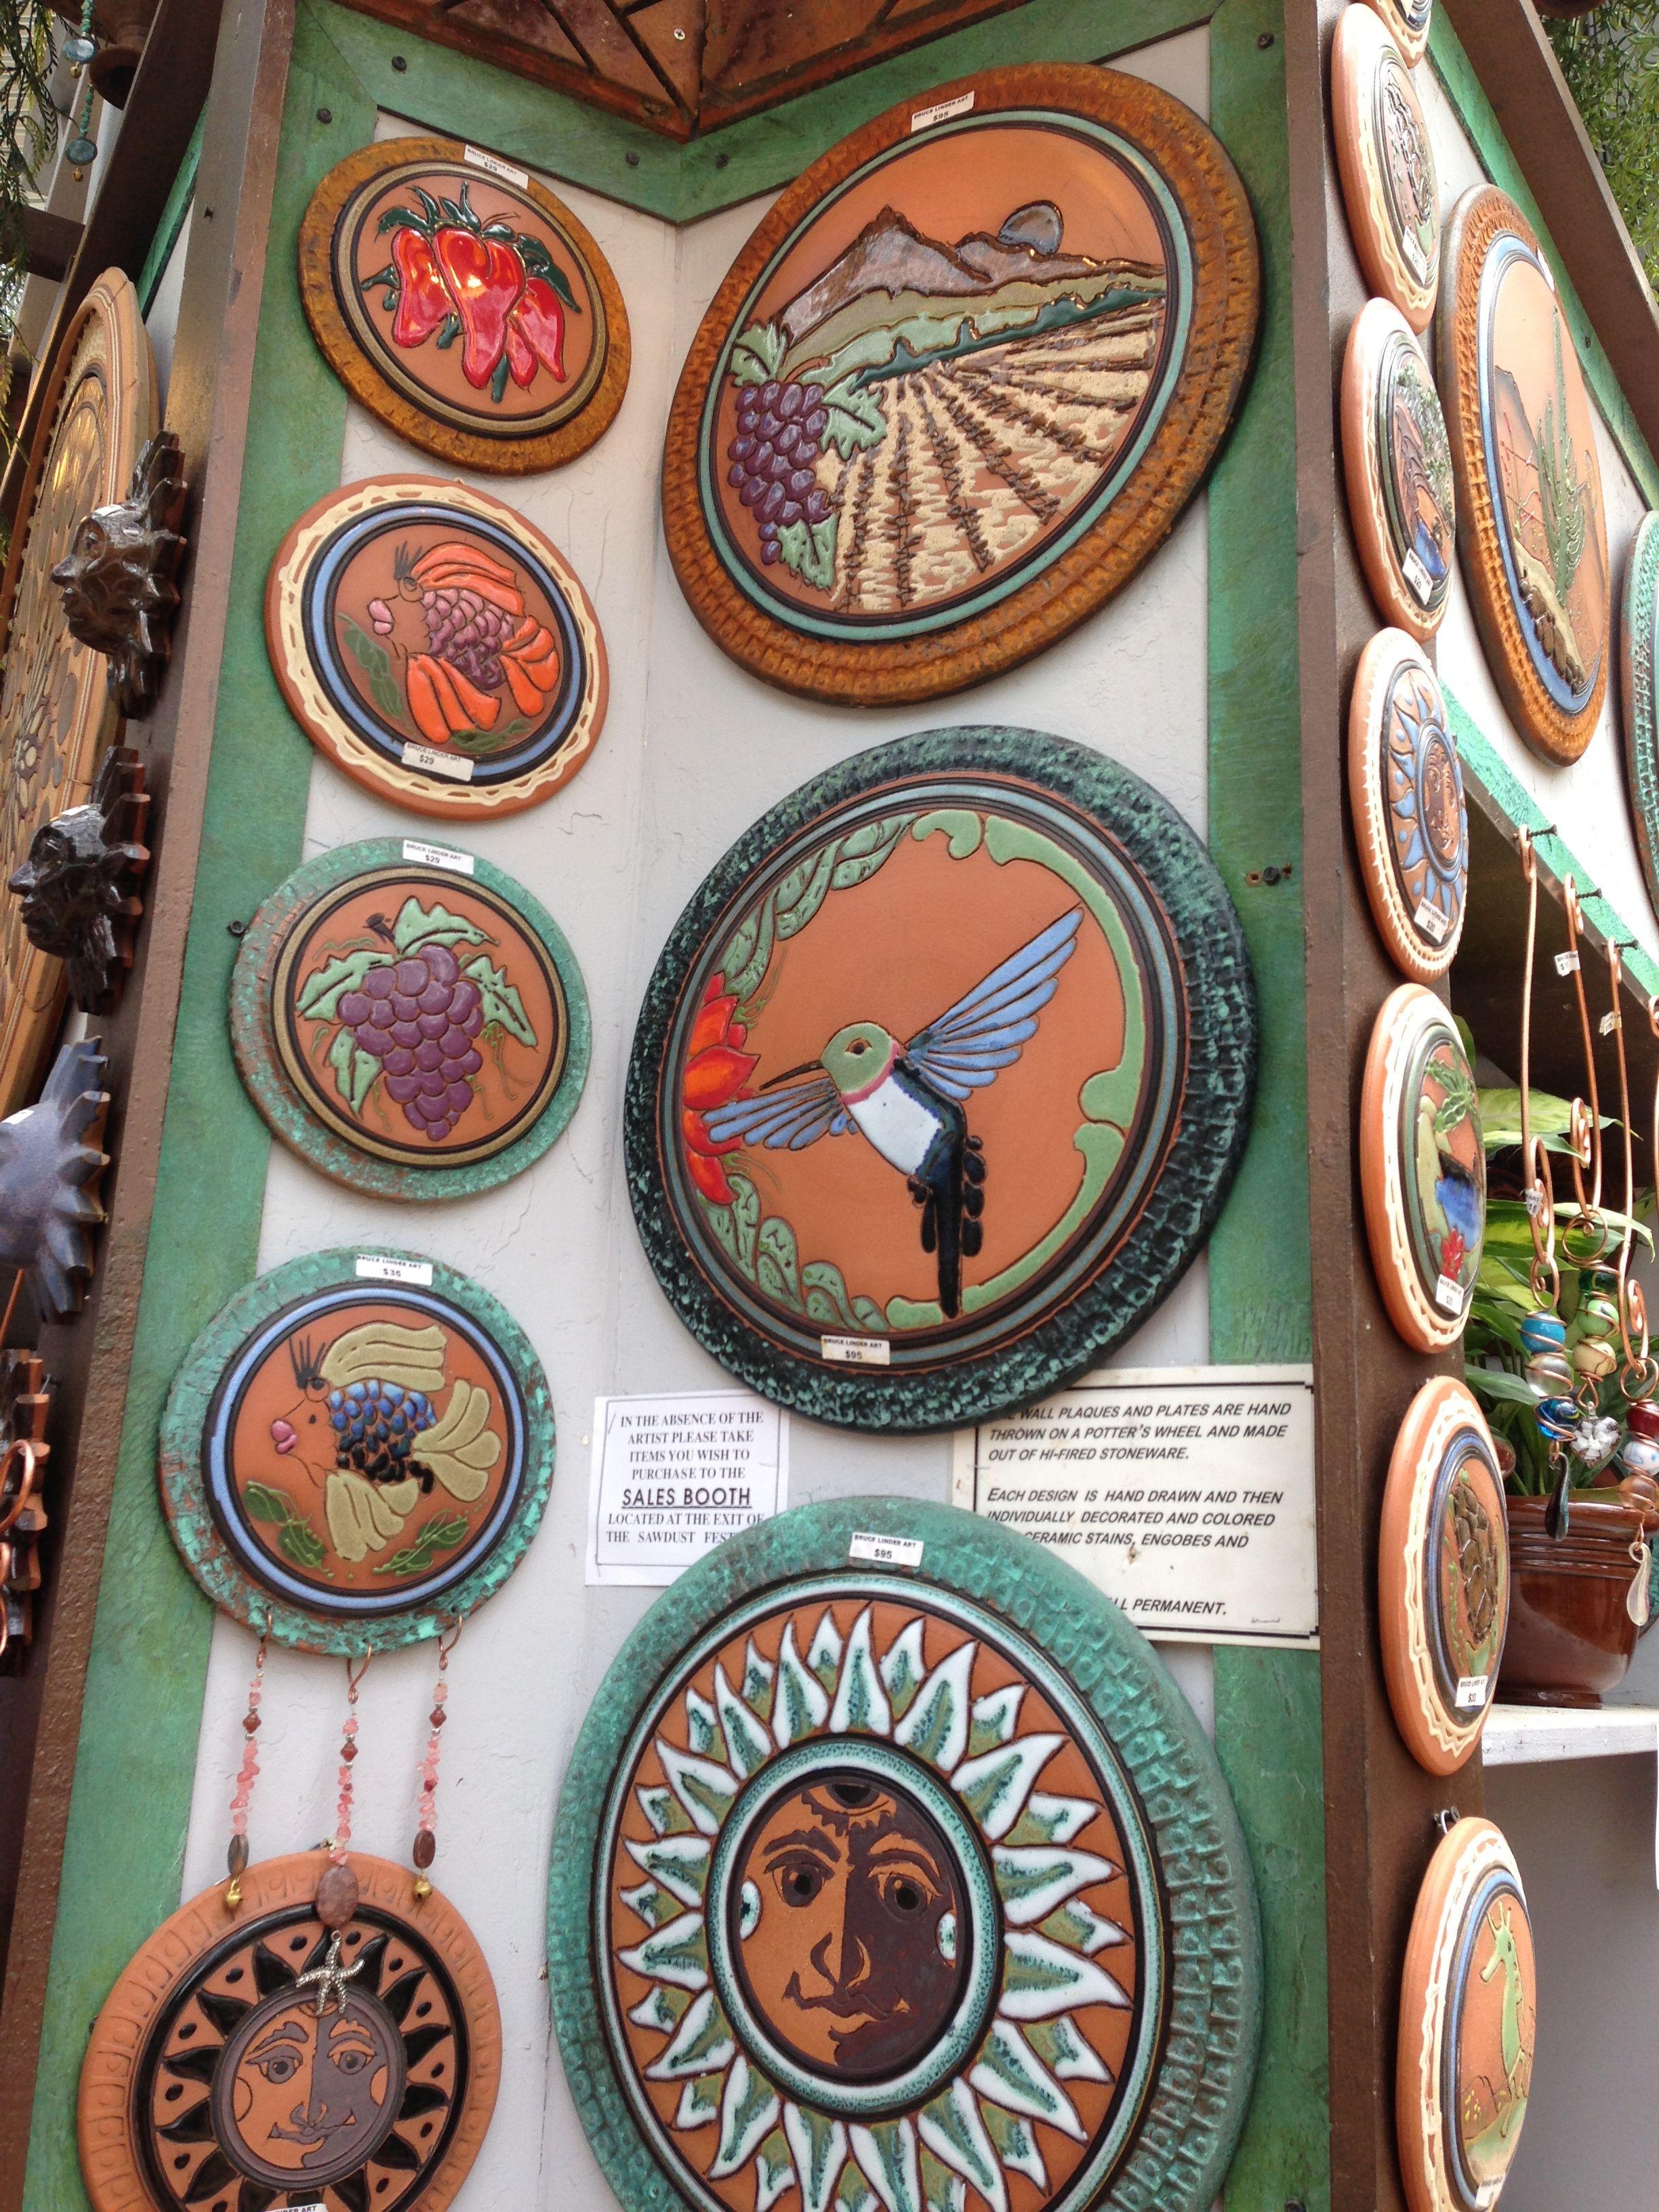 Ceramics Created By Bruce Linder At Sawdust Art Festival In Laguna Beach Sawdust Art Festival Ceramic Art Ceramics